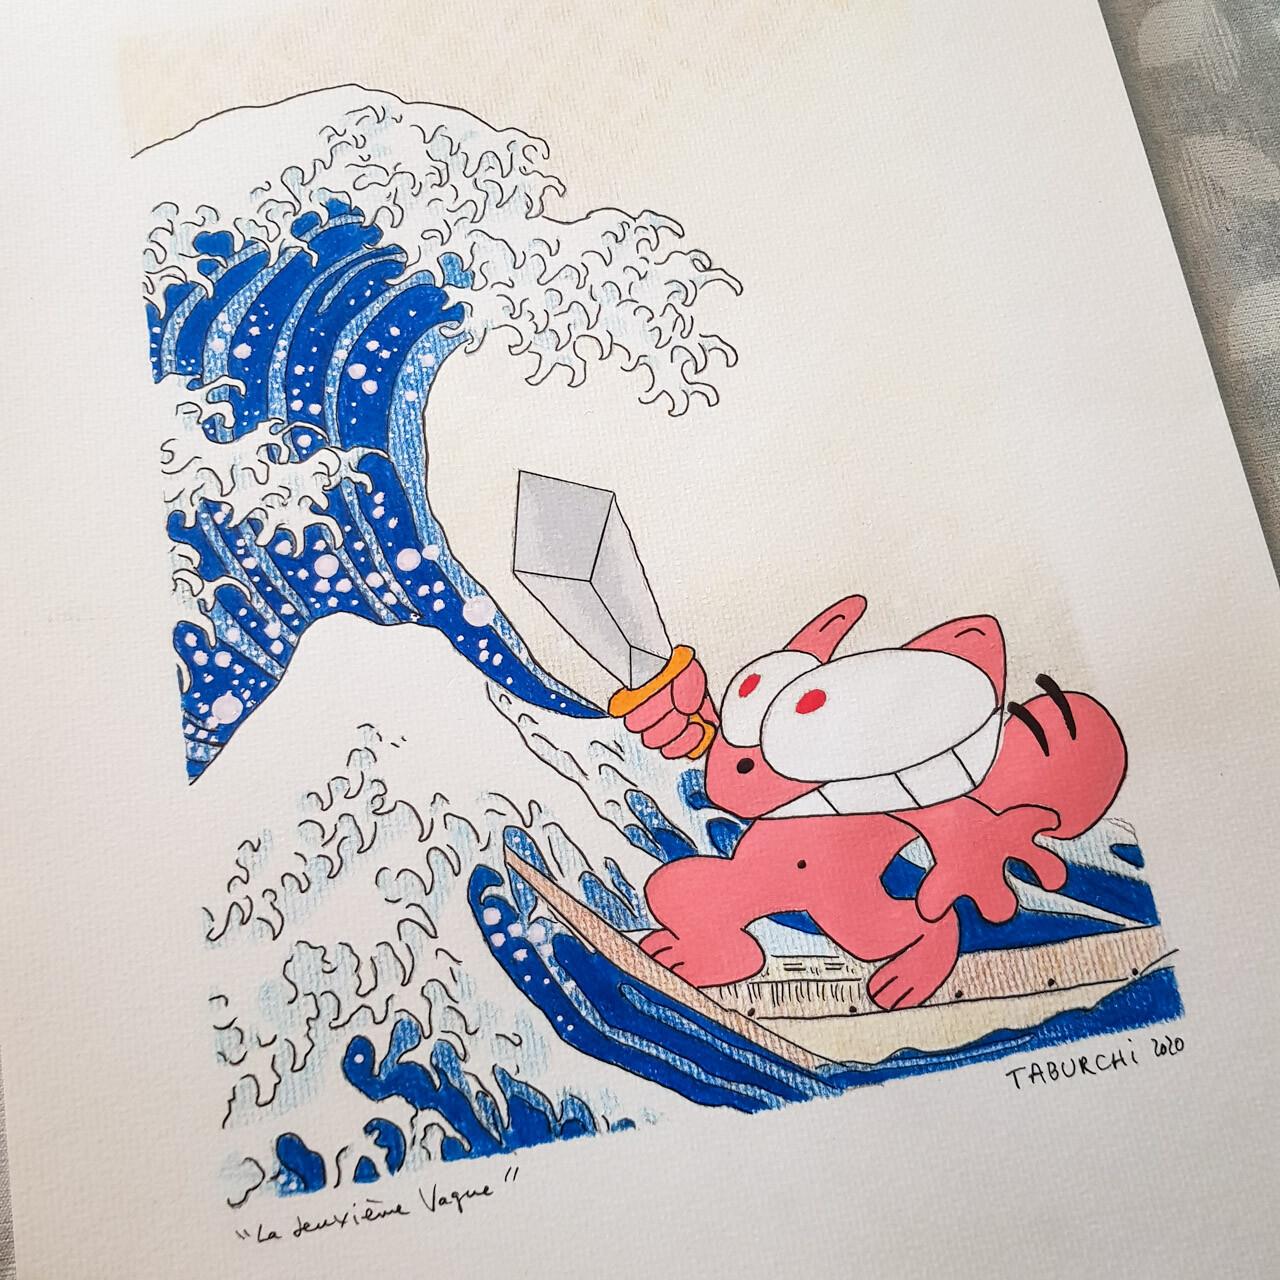 la-vague-hokusai-taburchi